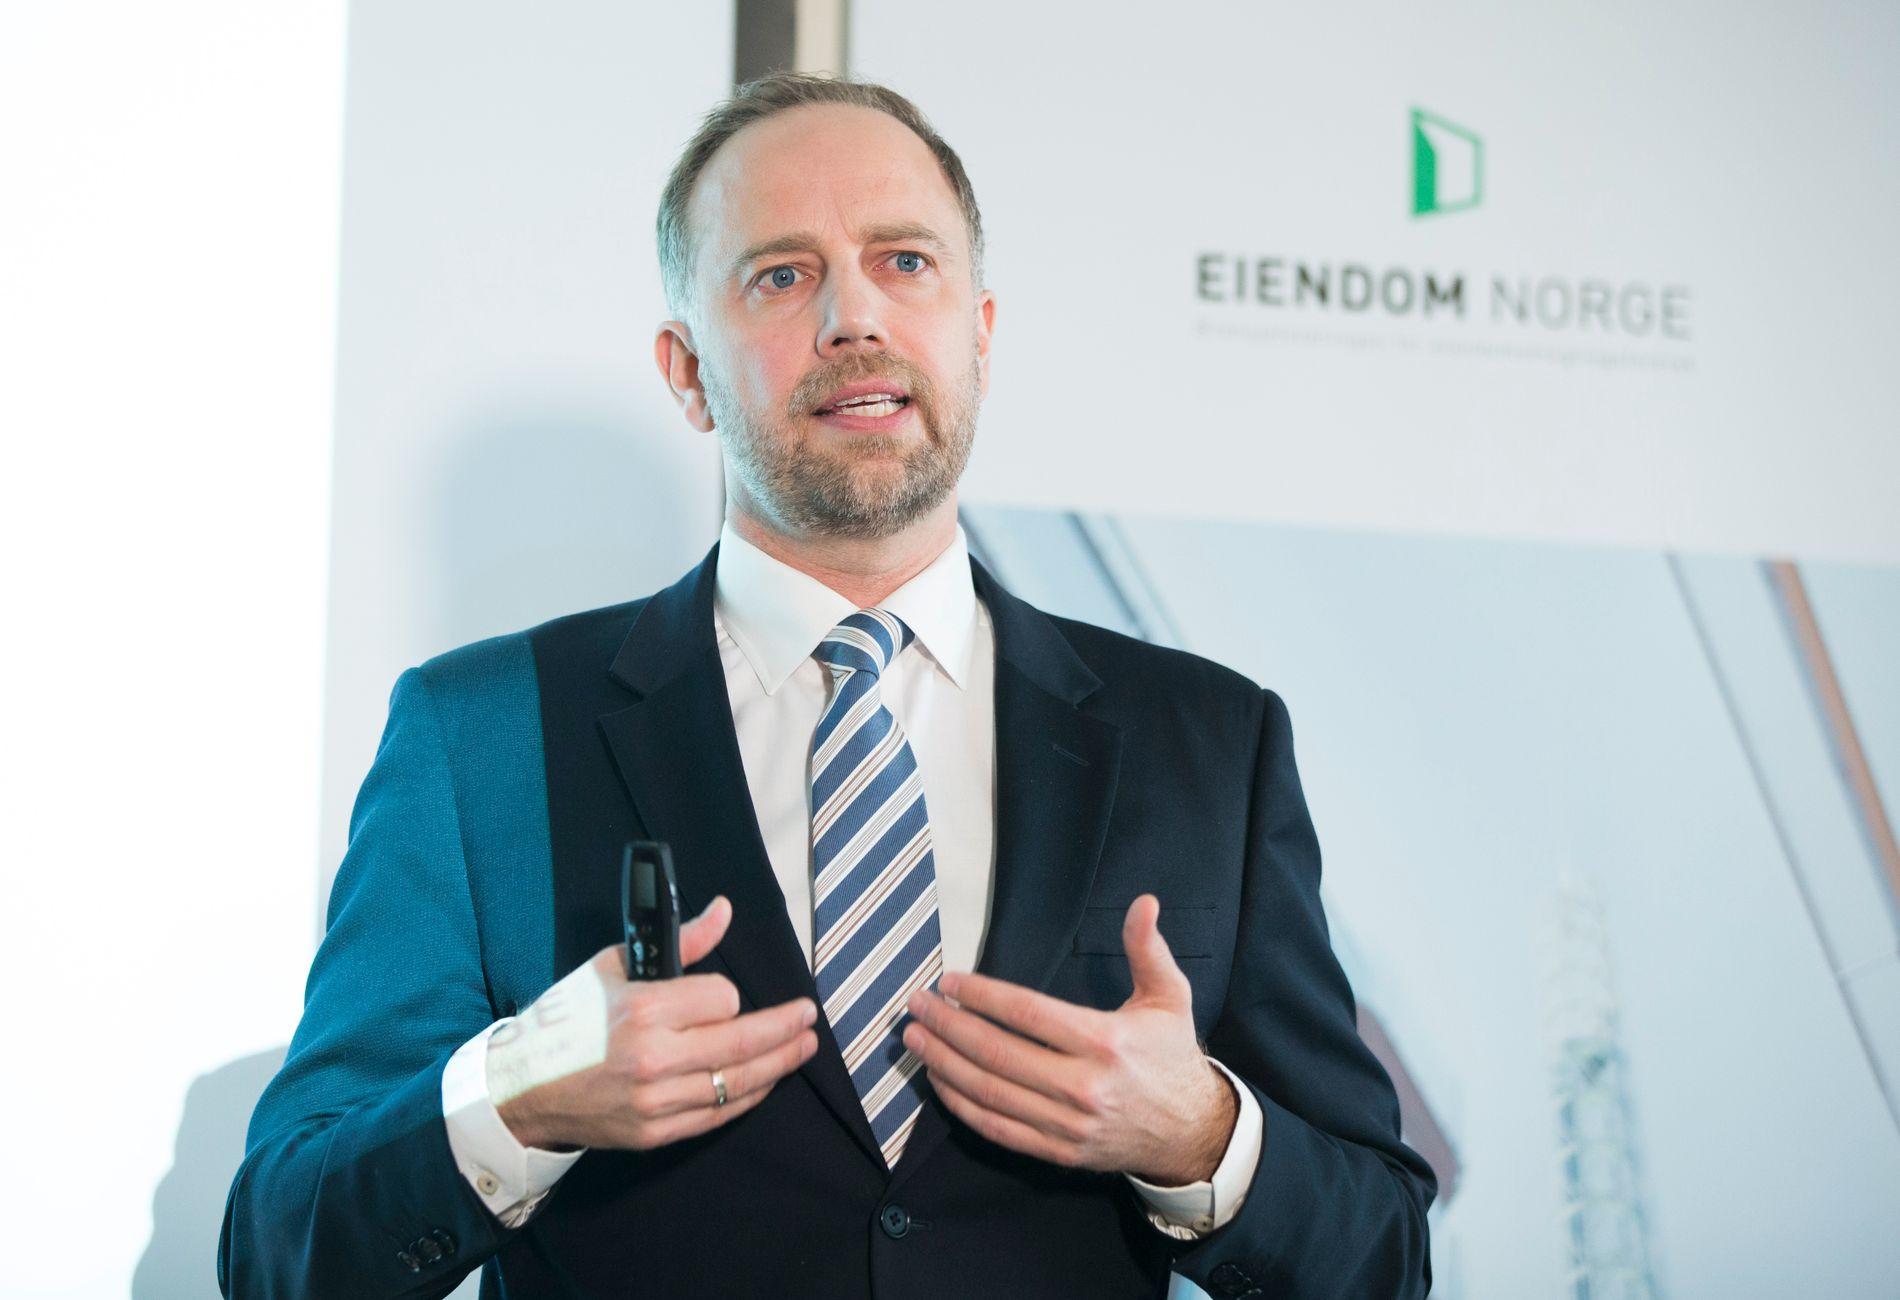 VEKST: Tosifret vekst i 2017, tror Dreyer i Eiendom Norge.